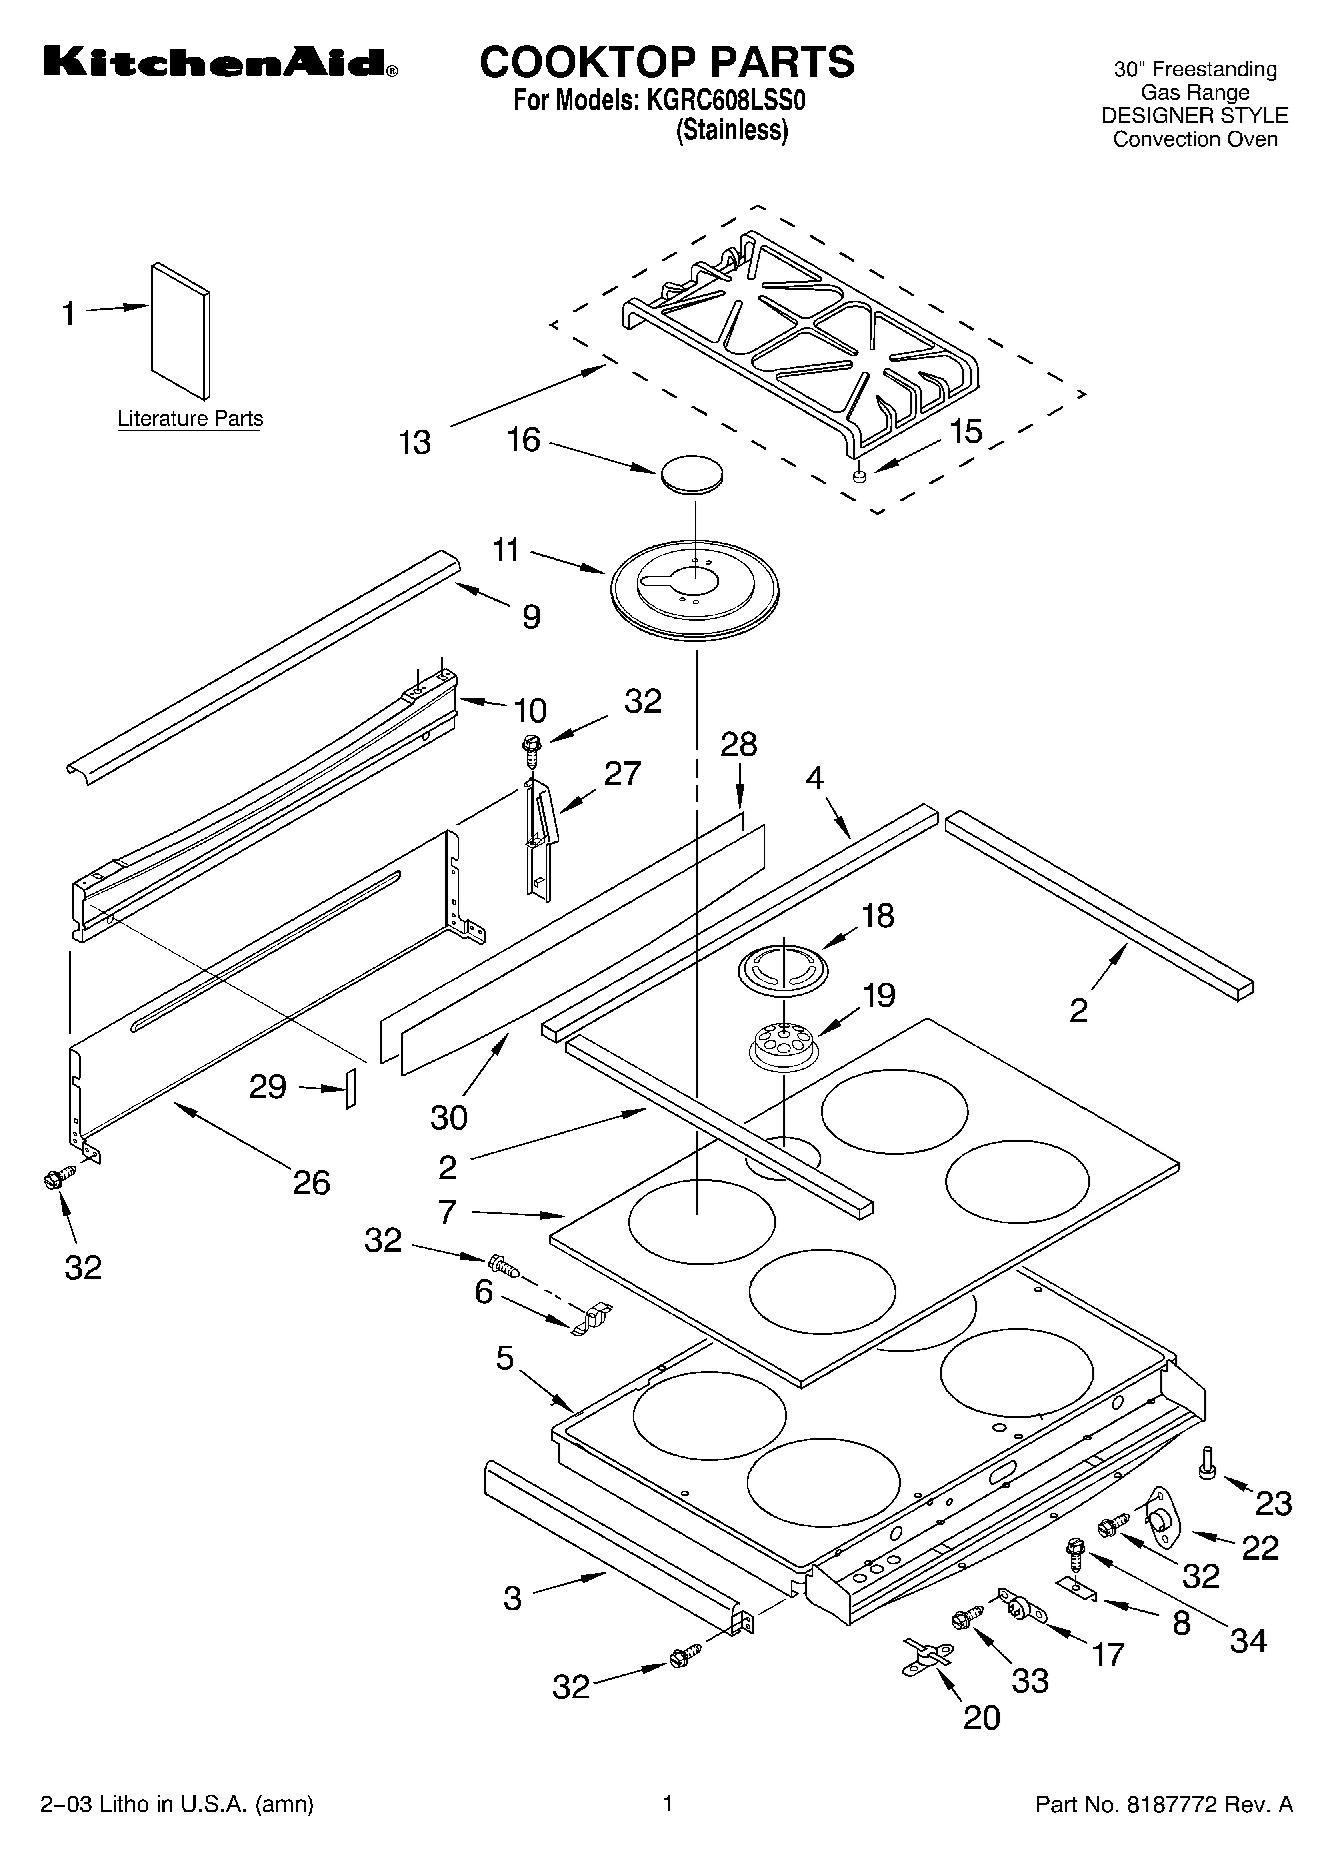 Gas Range Wiring Diagram Enthusiast Diagrams Viking Kitchenaid Stove Top House Symbols U2022 Rh Maxturner Co